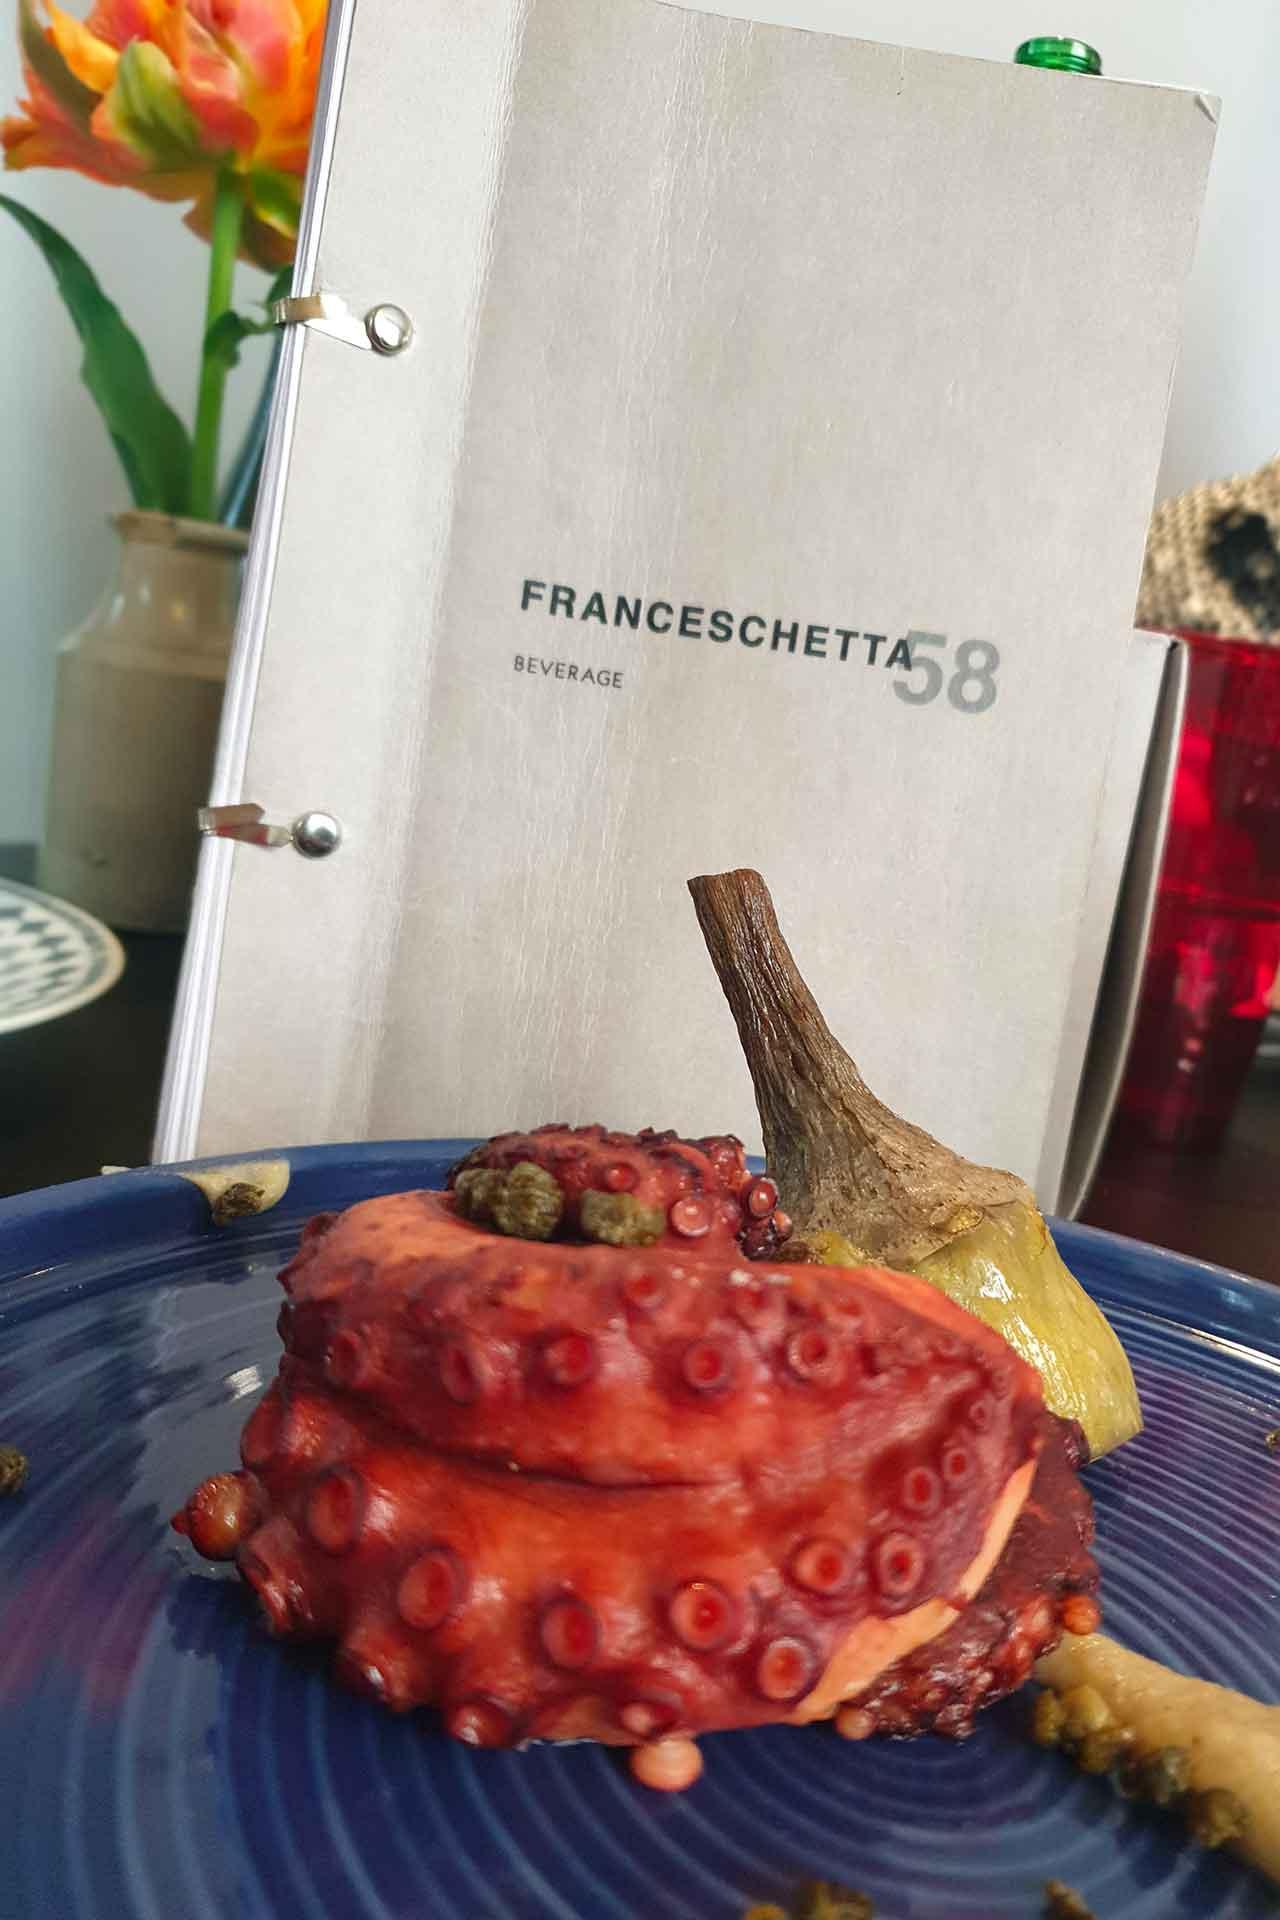 pranzo francreschetta 58